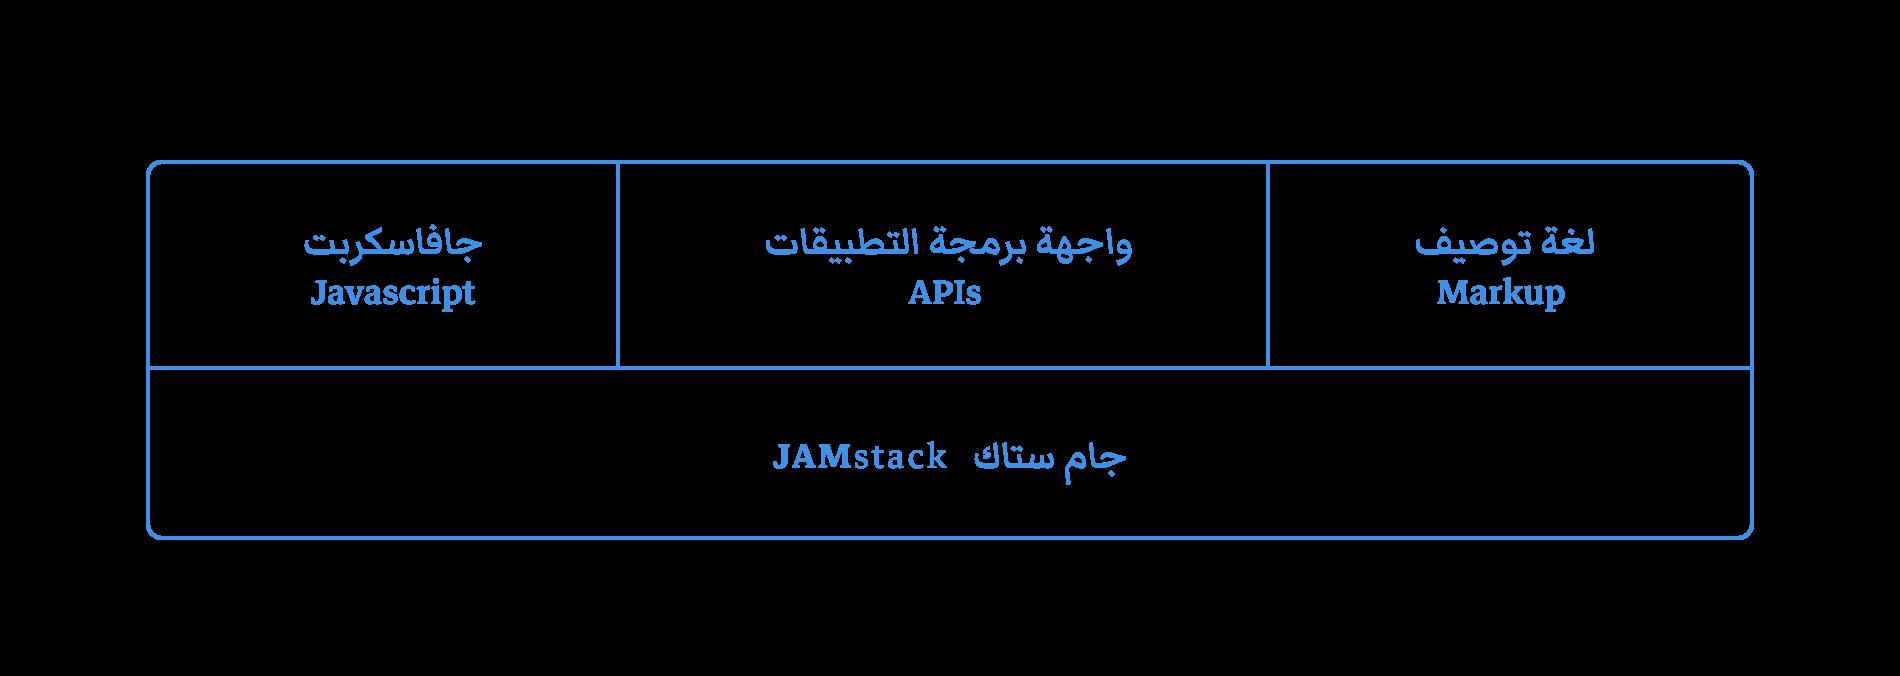 jamstack.png